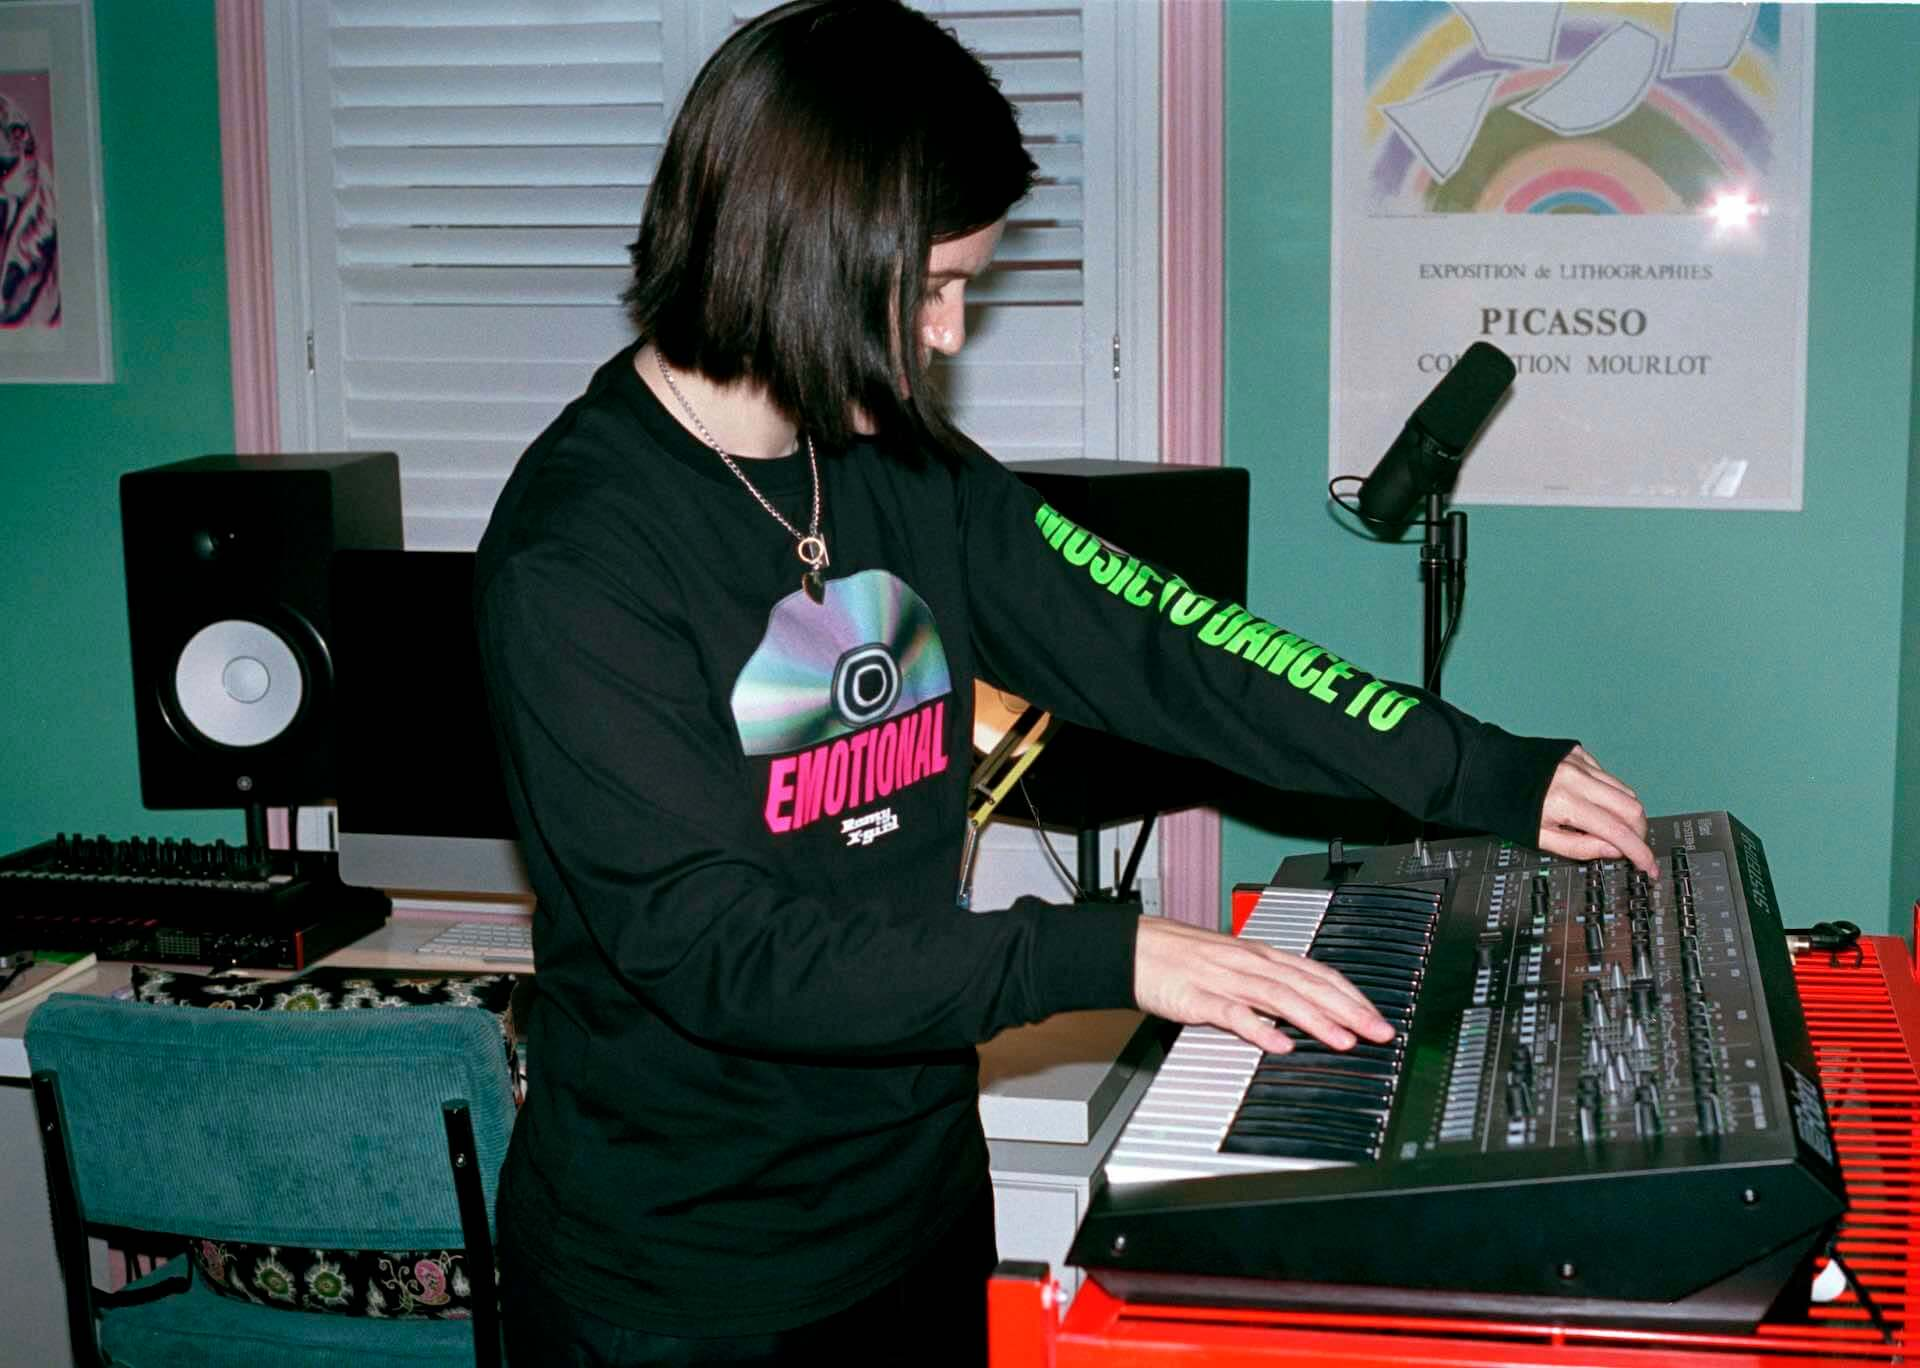 The xxのRomyとX-girlによるコラボアイテム第2弾が発表!本人出演のInstagramライブも実施決定 music210208_romy_6-1920x1368